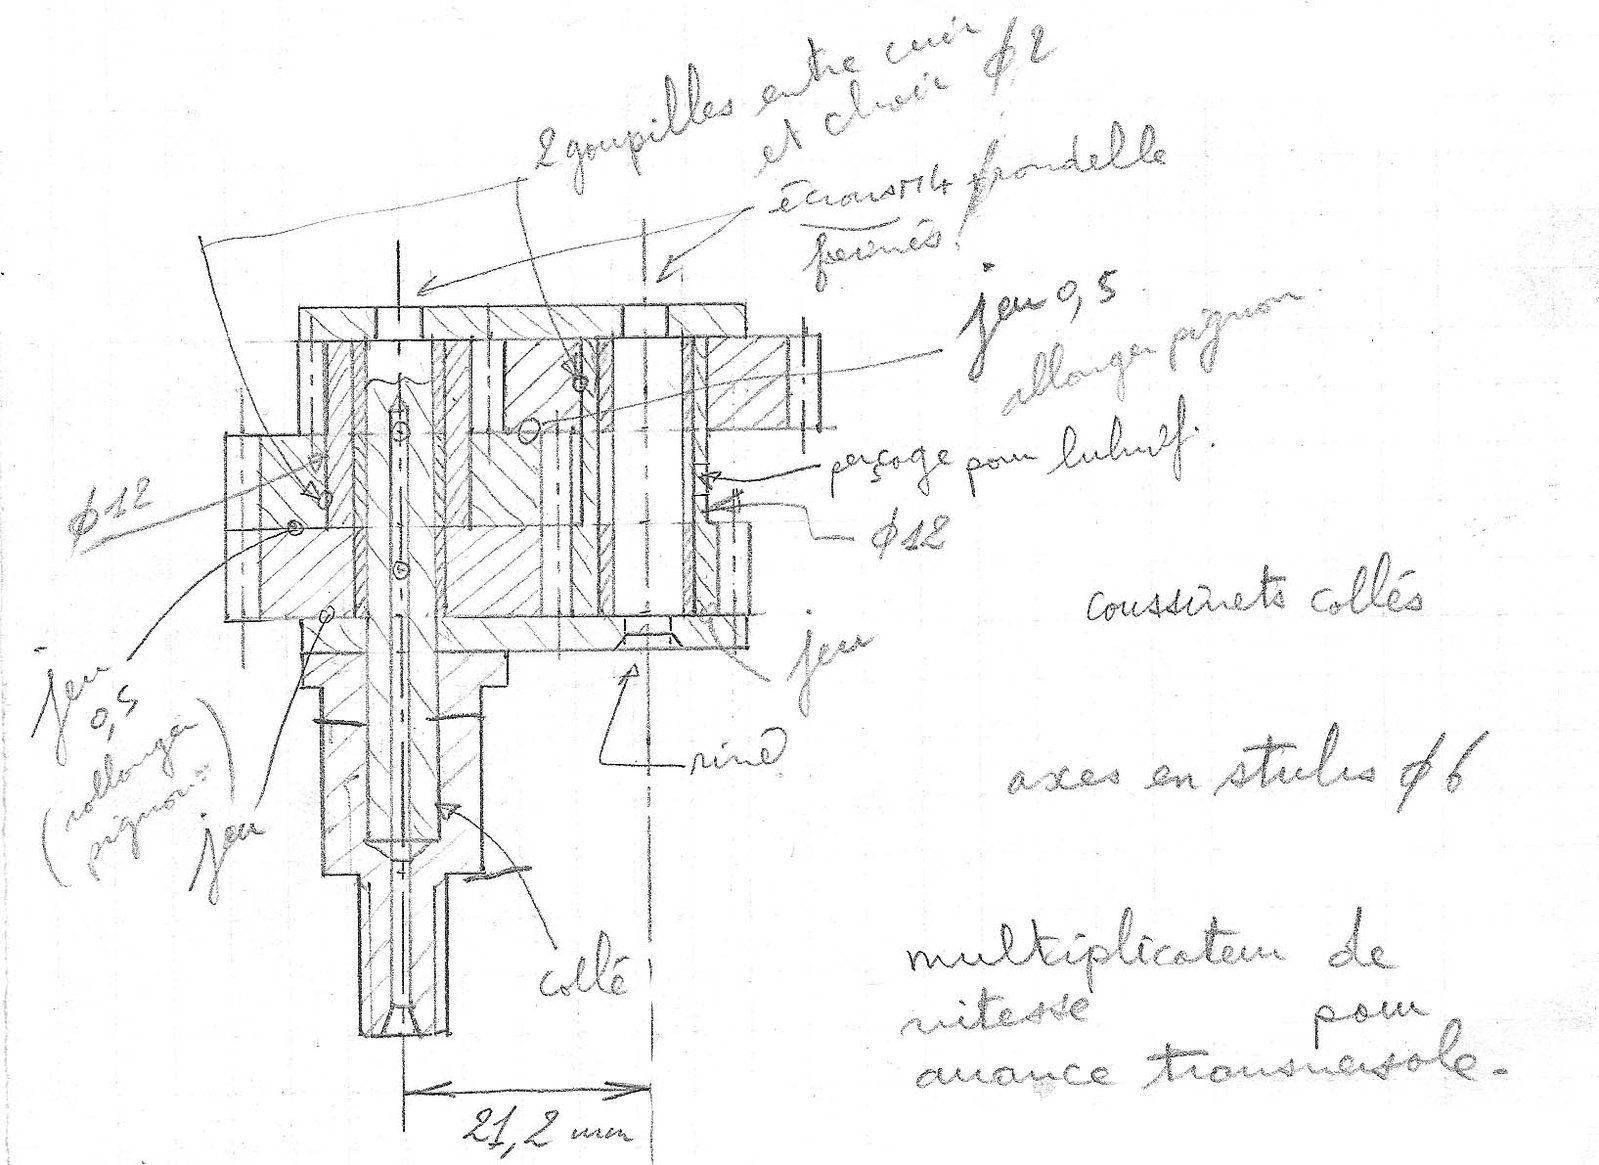 multiplicateur av trans LW130 dessin.jpg